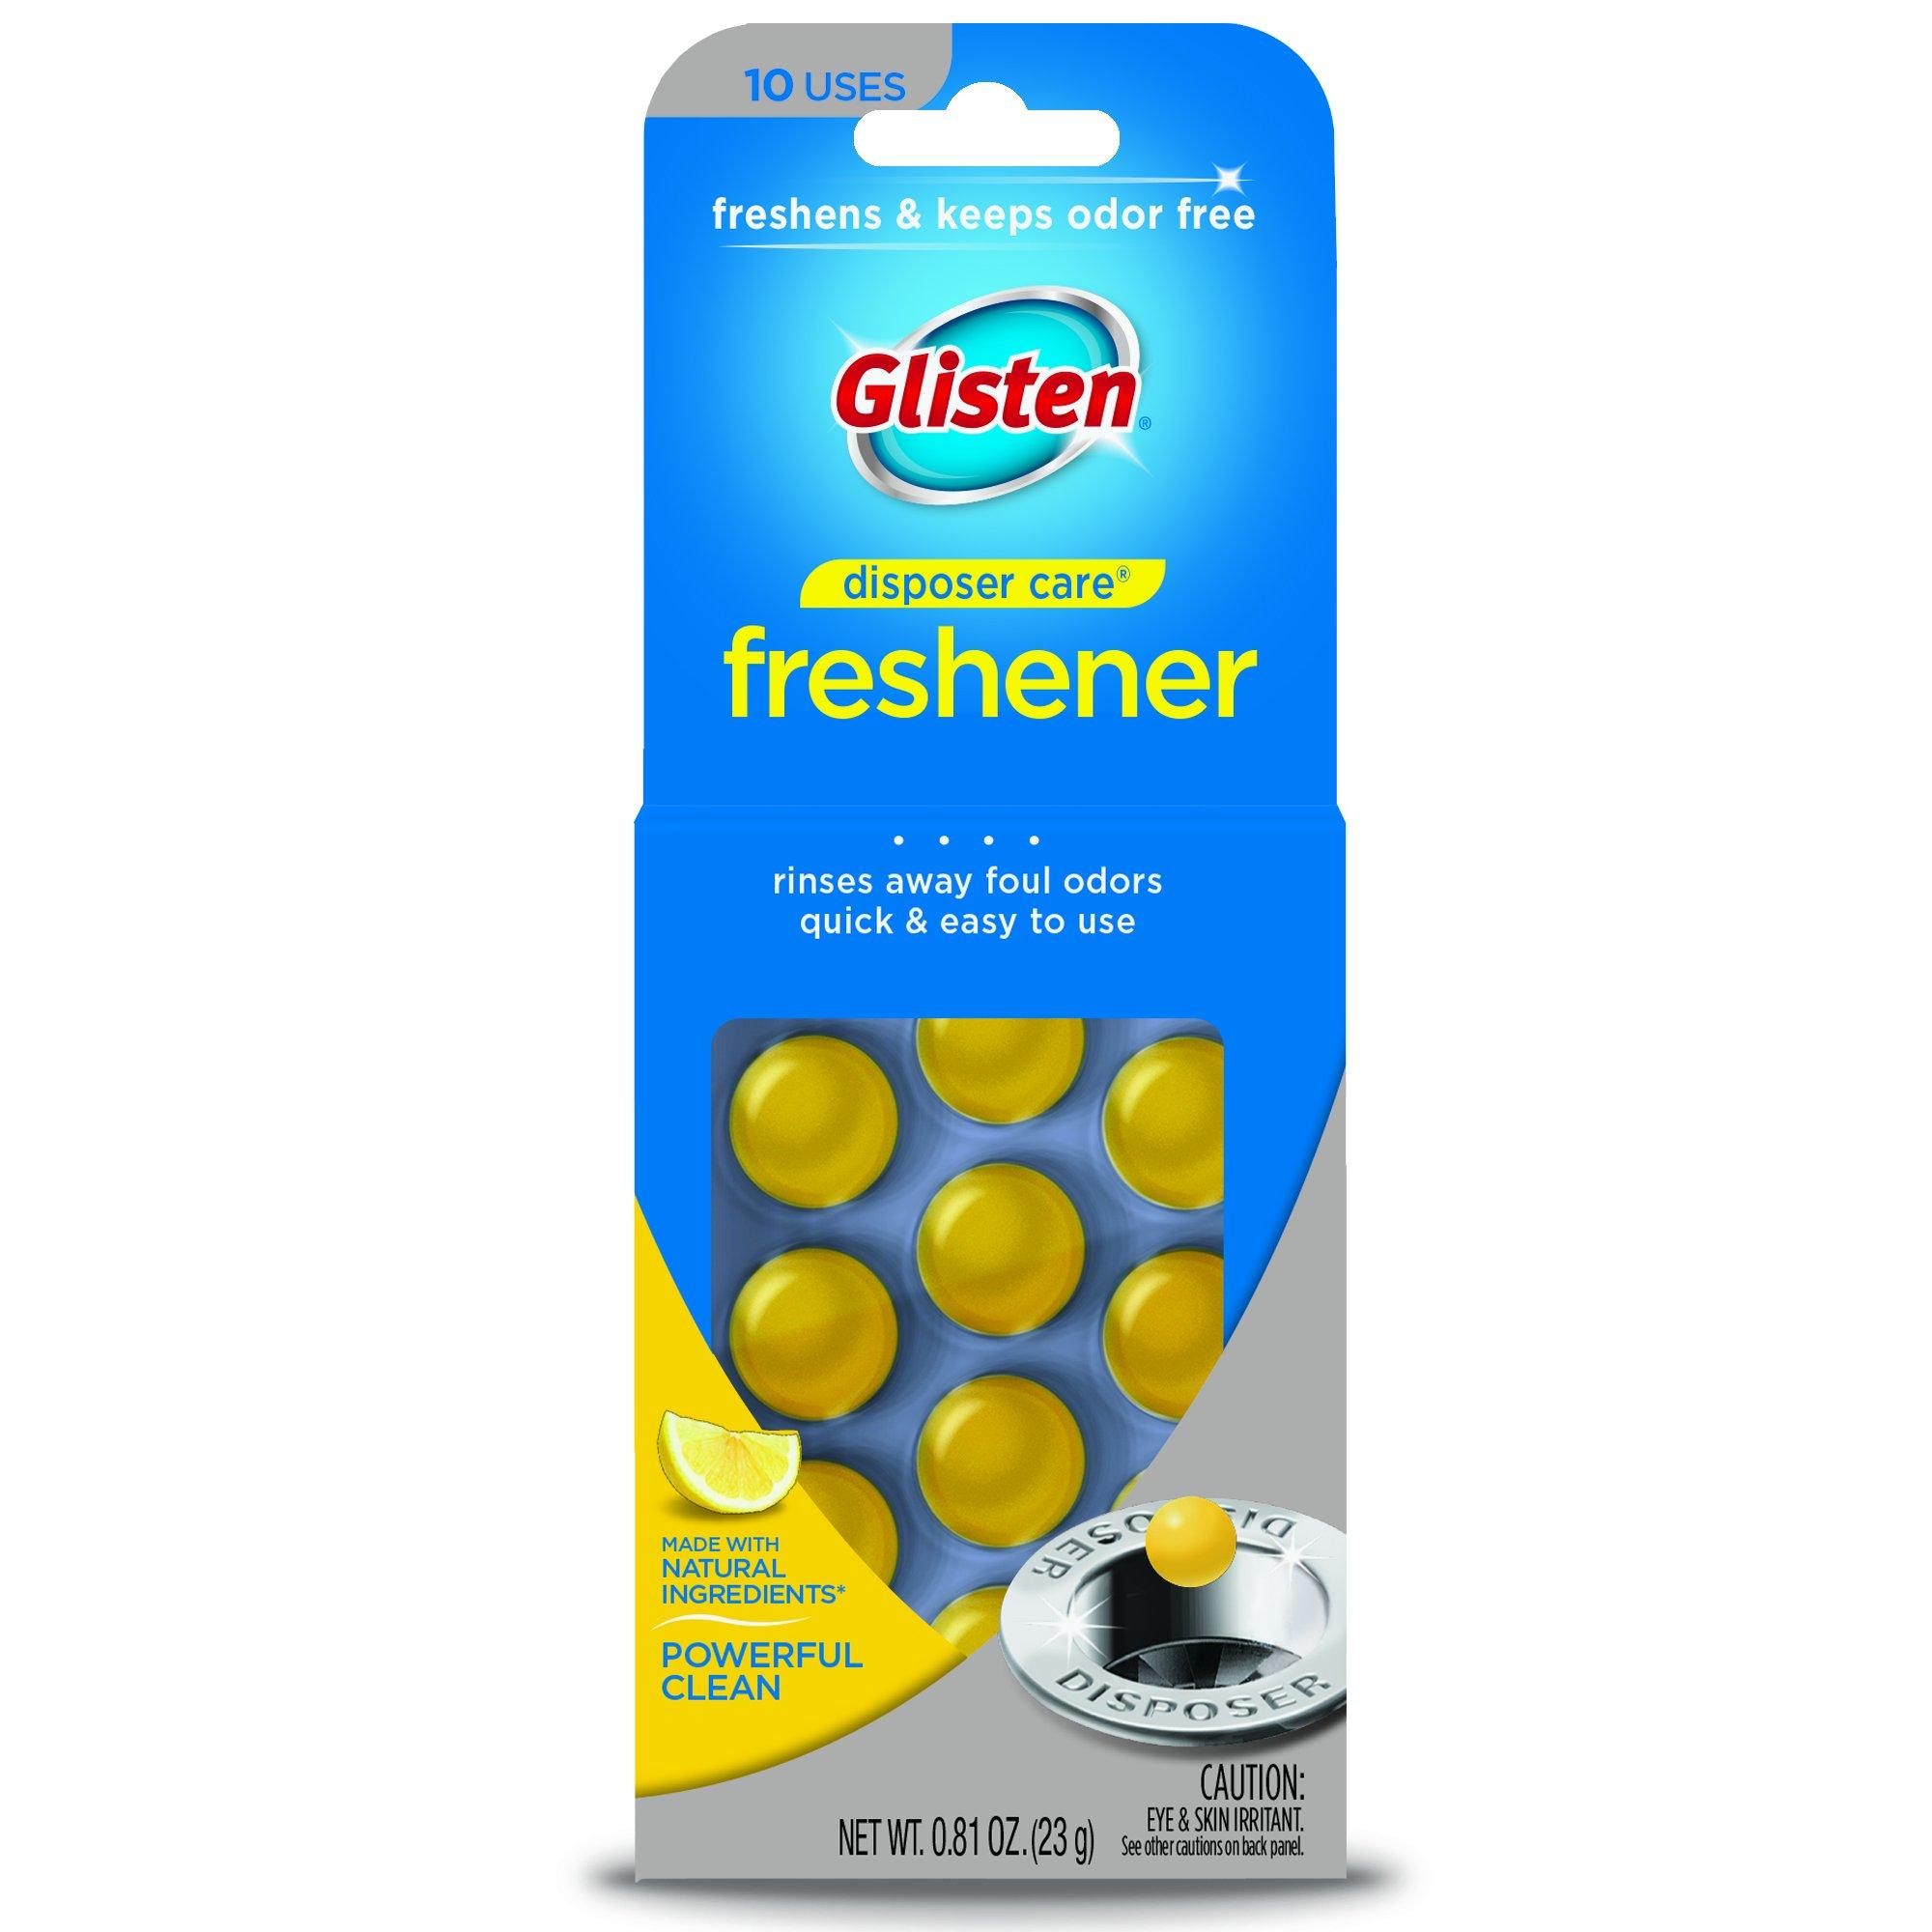 Glisten Disposer Care Freshener, Lemon Scent, 12 Pack, 120 Use by Glisten (Image #1)